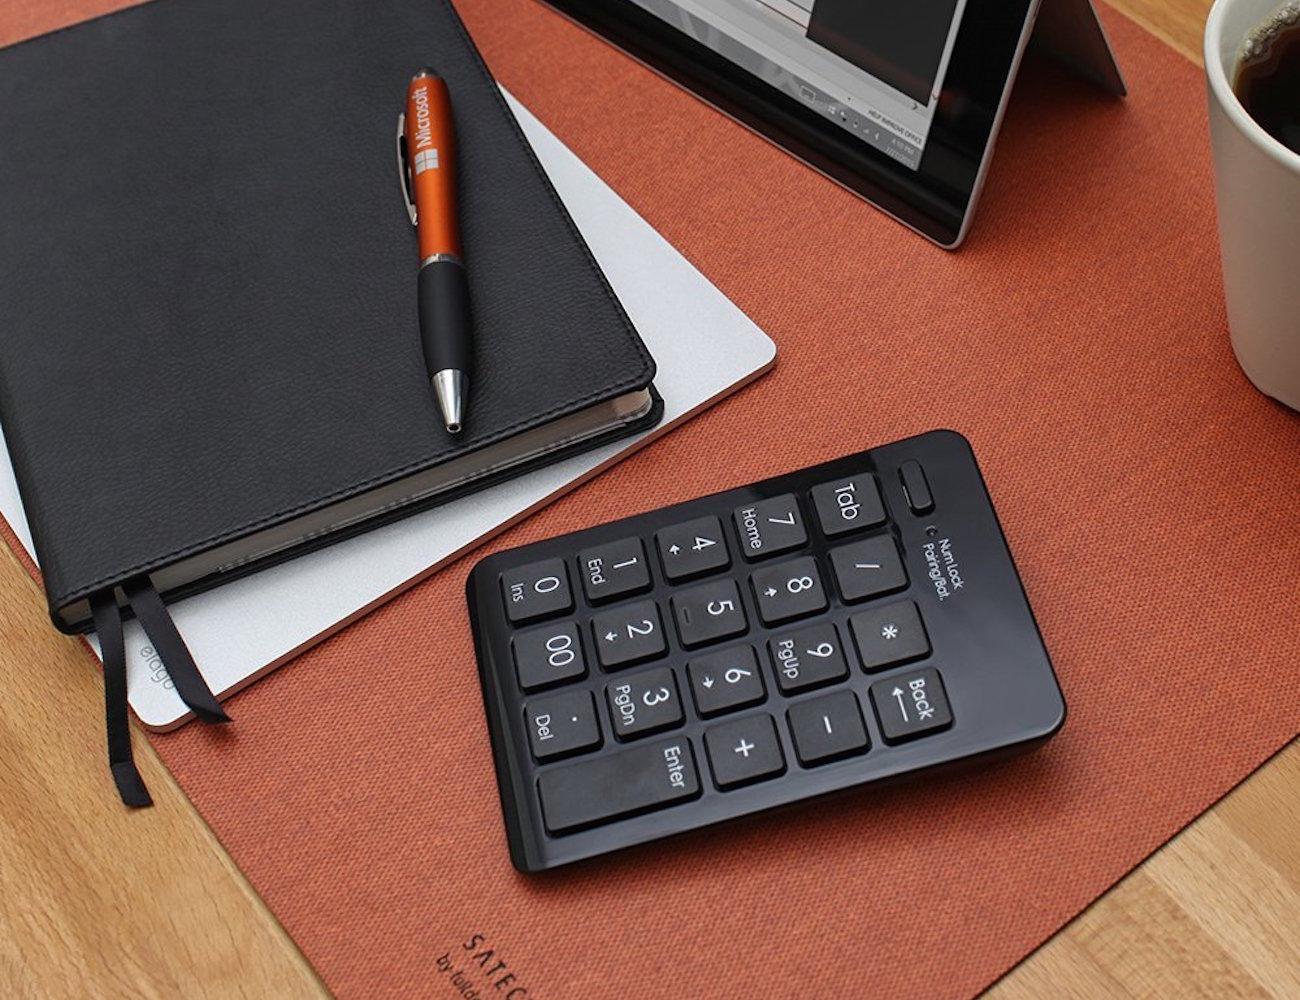 Show williamhill rücktrittskosten williamhill kundenservice email details for Toshiba USB Numeric Keypad with 2-port Hub